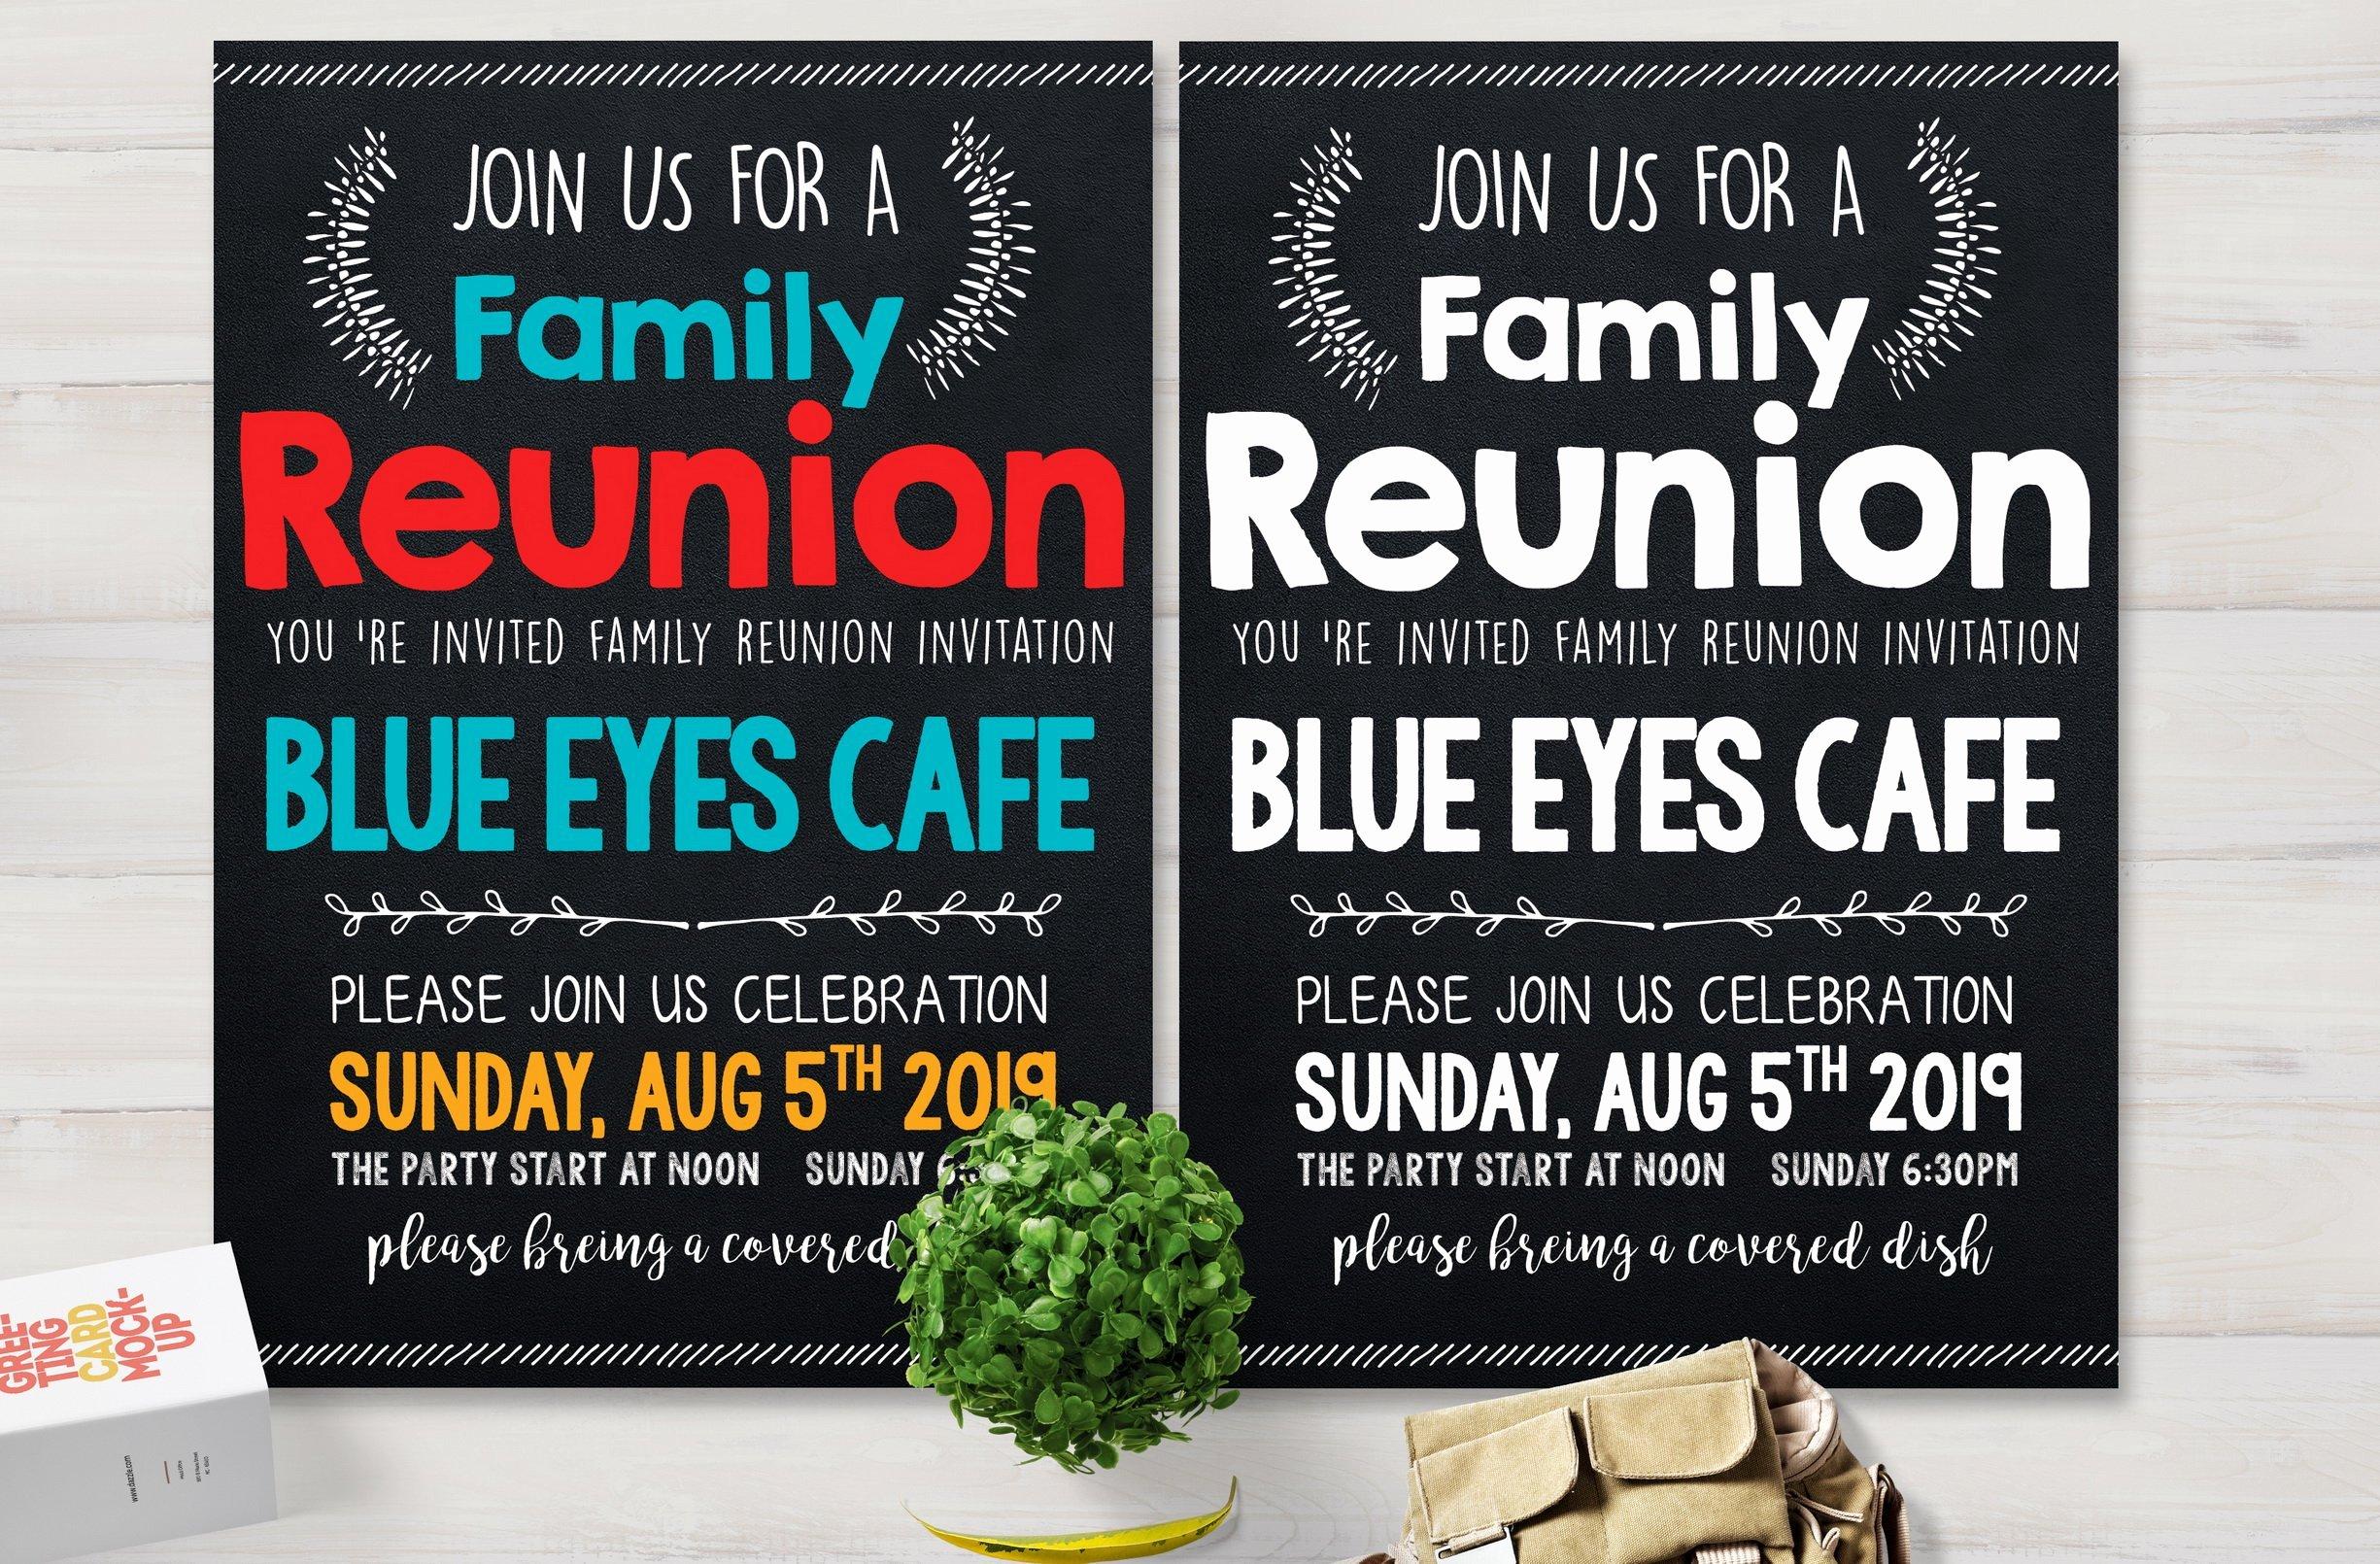 Family Reunion Flyer Templates Inspirational Family Reunion Party Flyer Card Templates Creative Market